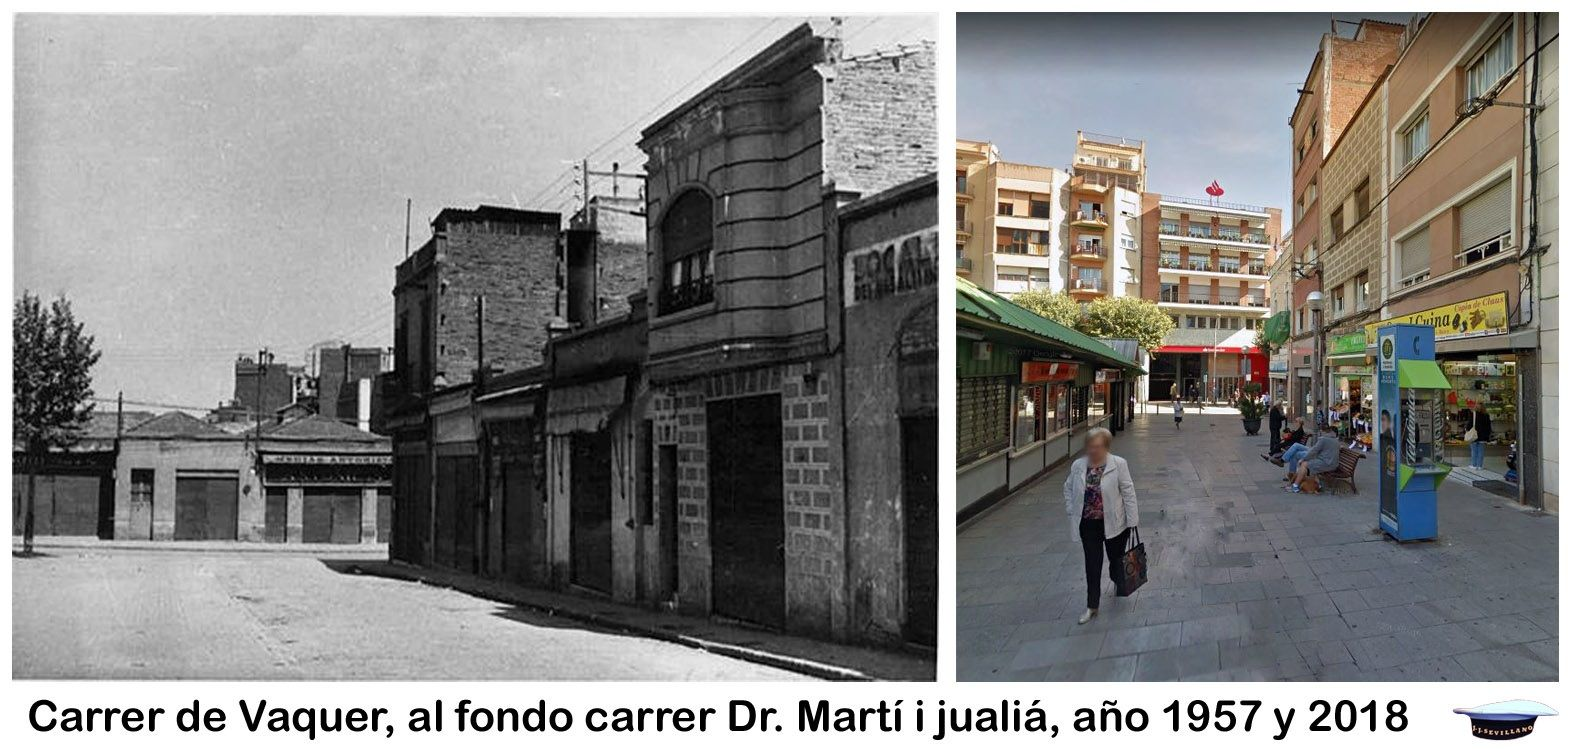 Carrer De Vaquer Al Fondo Carrer Dr Martí I Juliá Año 1957 Y 2018 Barcelona Marti Fondo